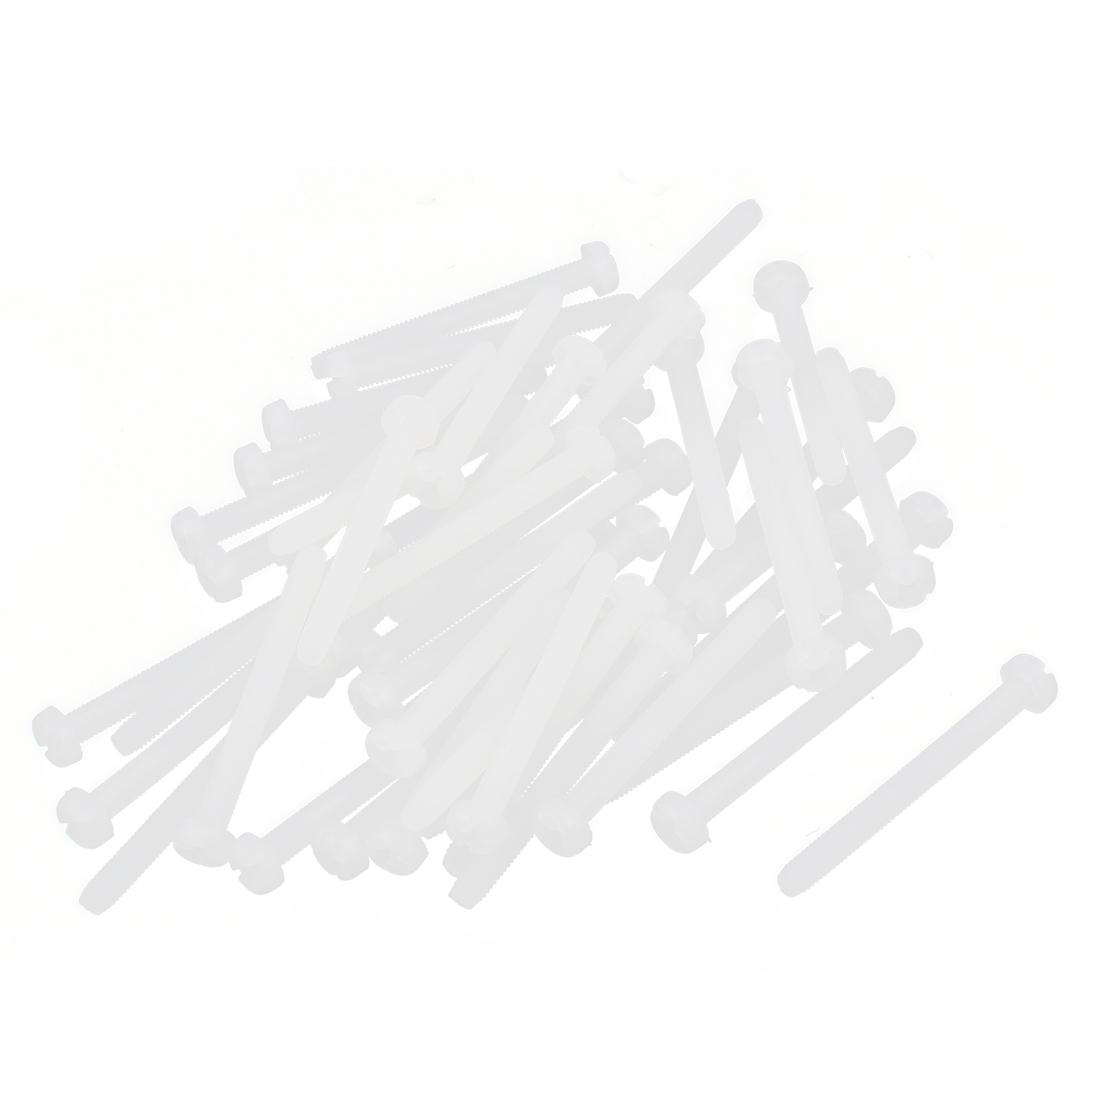 M3 x 30mm Nylon 6/6 Fillister Head Phillips Drive Machine Screws Off White 50pcs